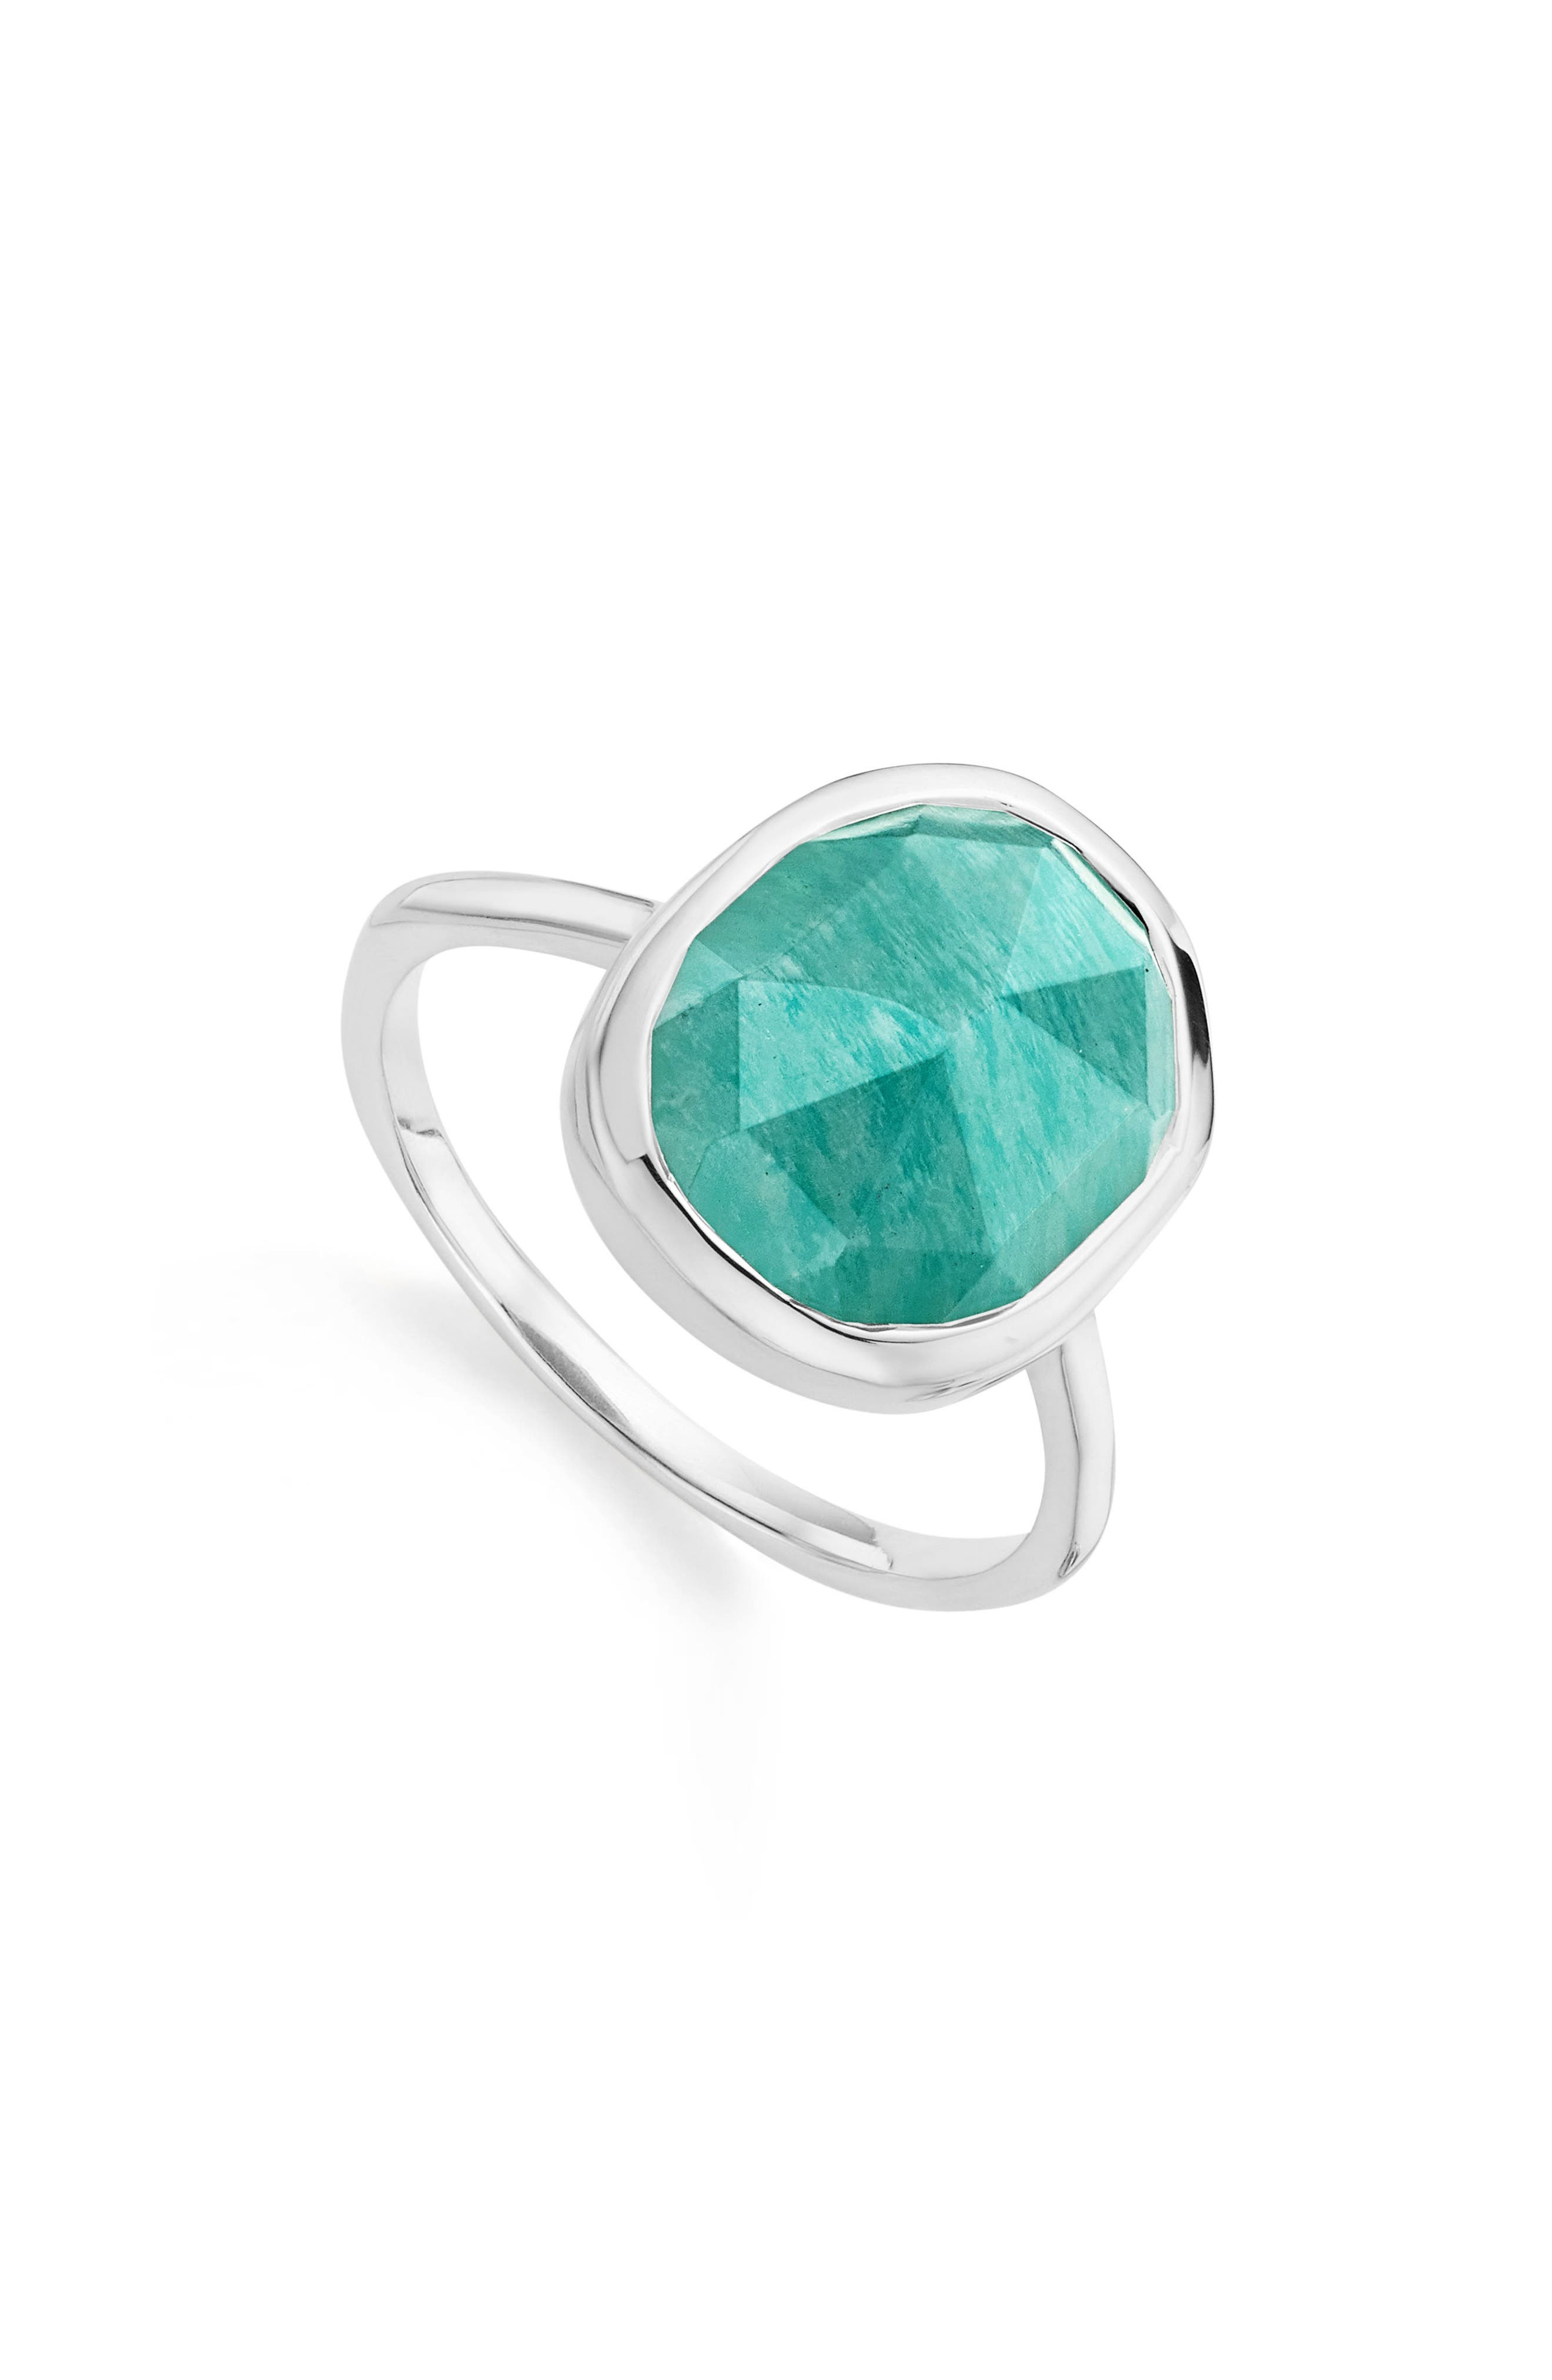 Monica Vinader 'Siren' Medium Semiprecious Stone Stacking Ring